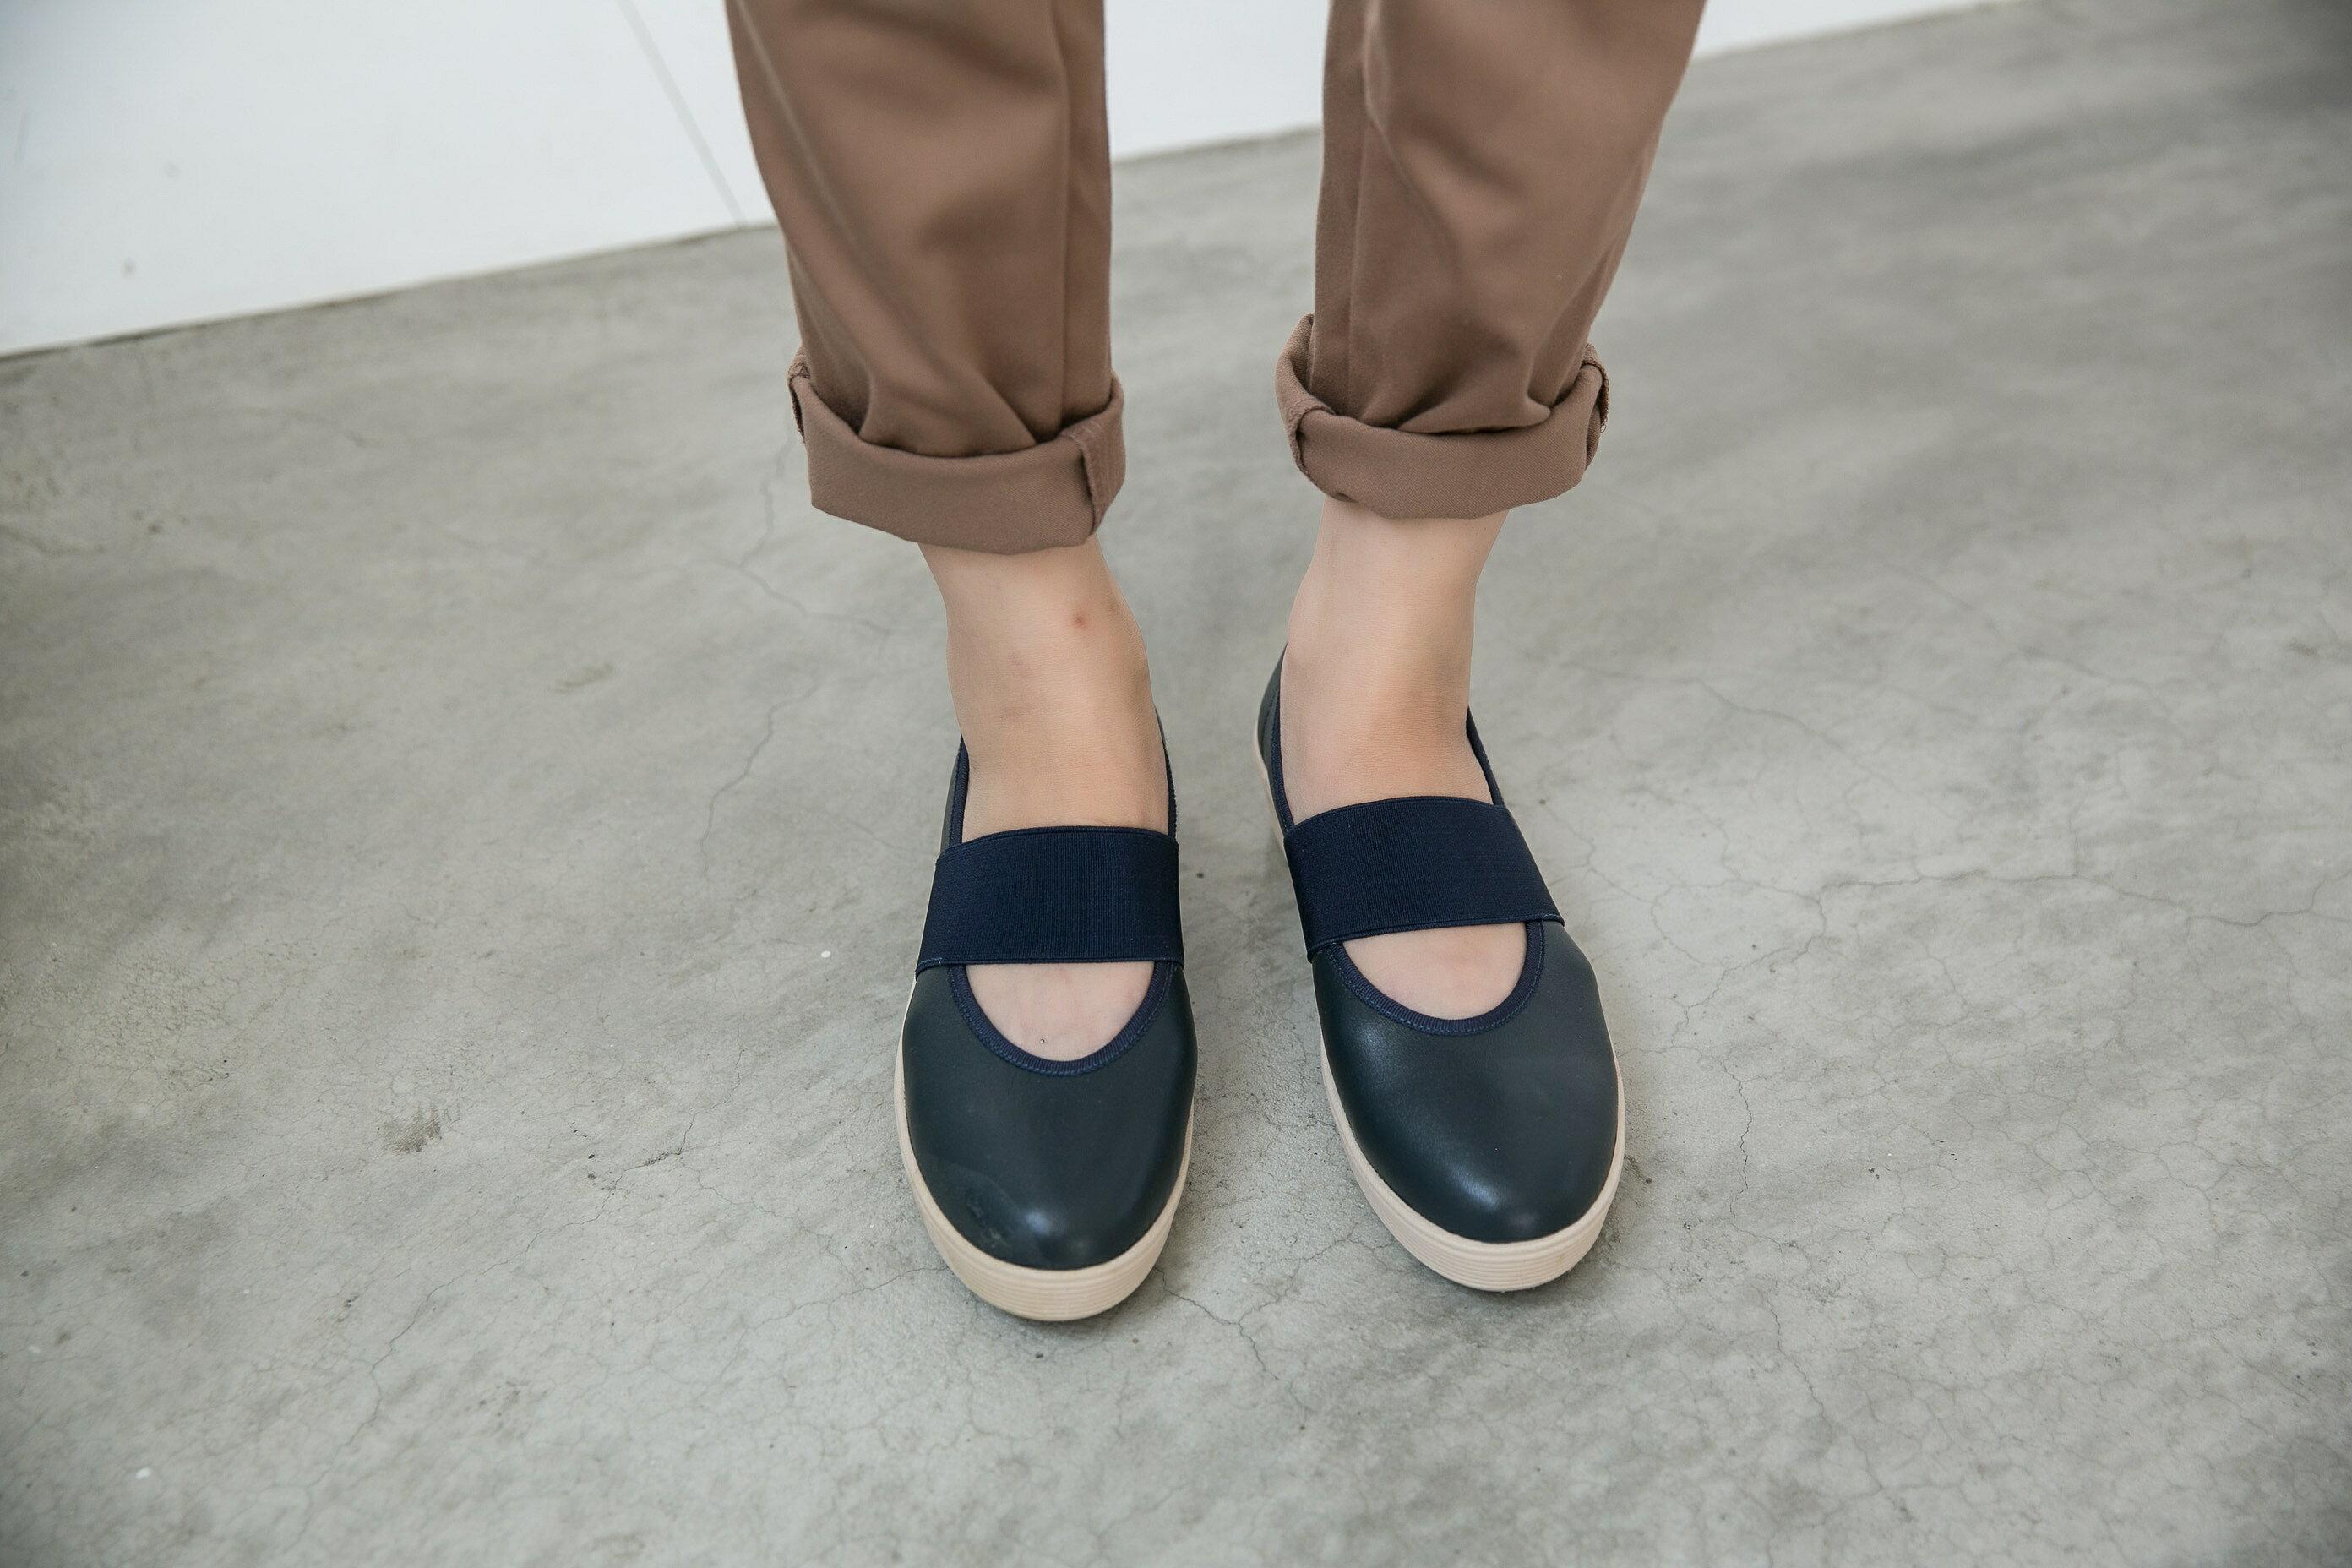 Aimez La Vie 超輕氣墊鞋|圓頭鬆緊帶厚牛皮休閒鞋 1